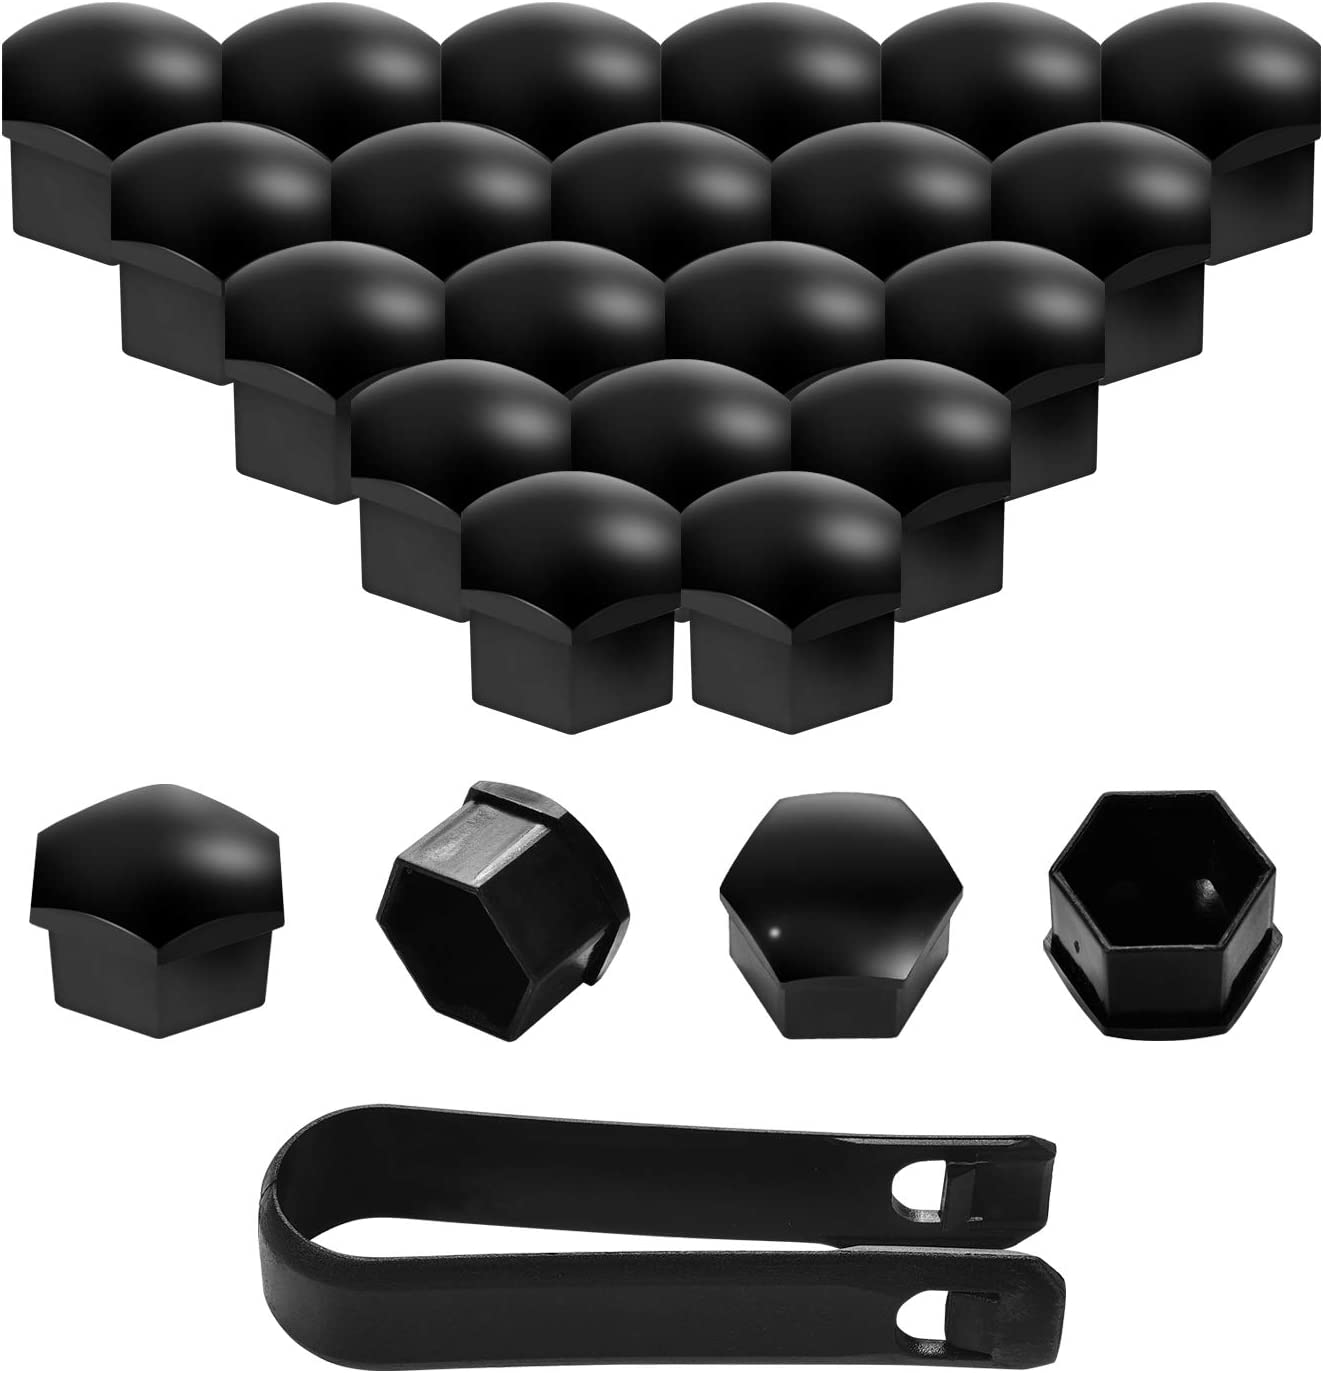 moinkerin 20 Piezas Tapas de Tornillos Tapas de Tuercas Tapas Nuez Universal 17mm Cubierta de Tuerca para Coches Ruedas con Herramienta Negro